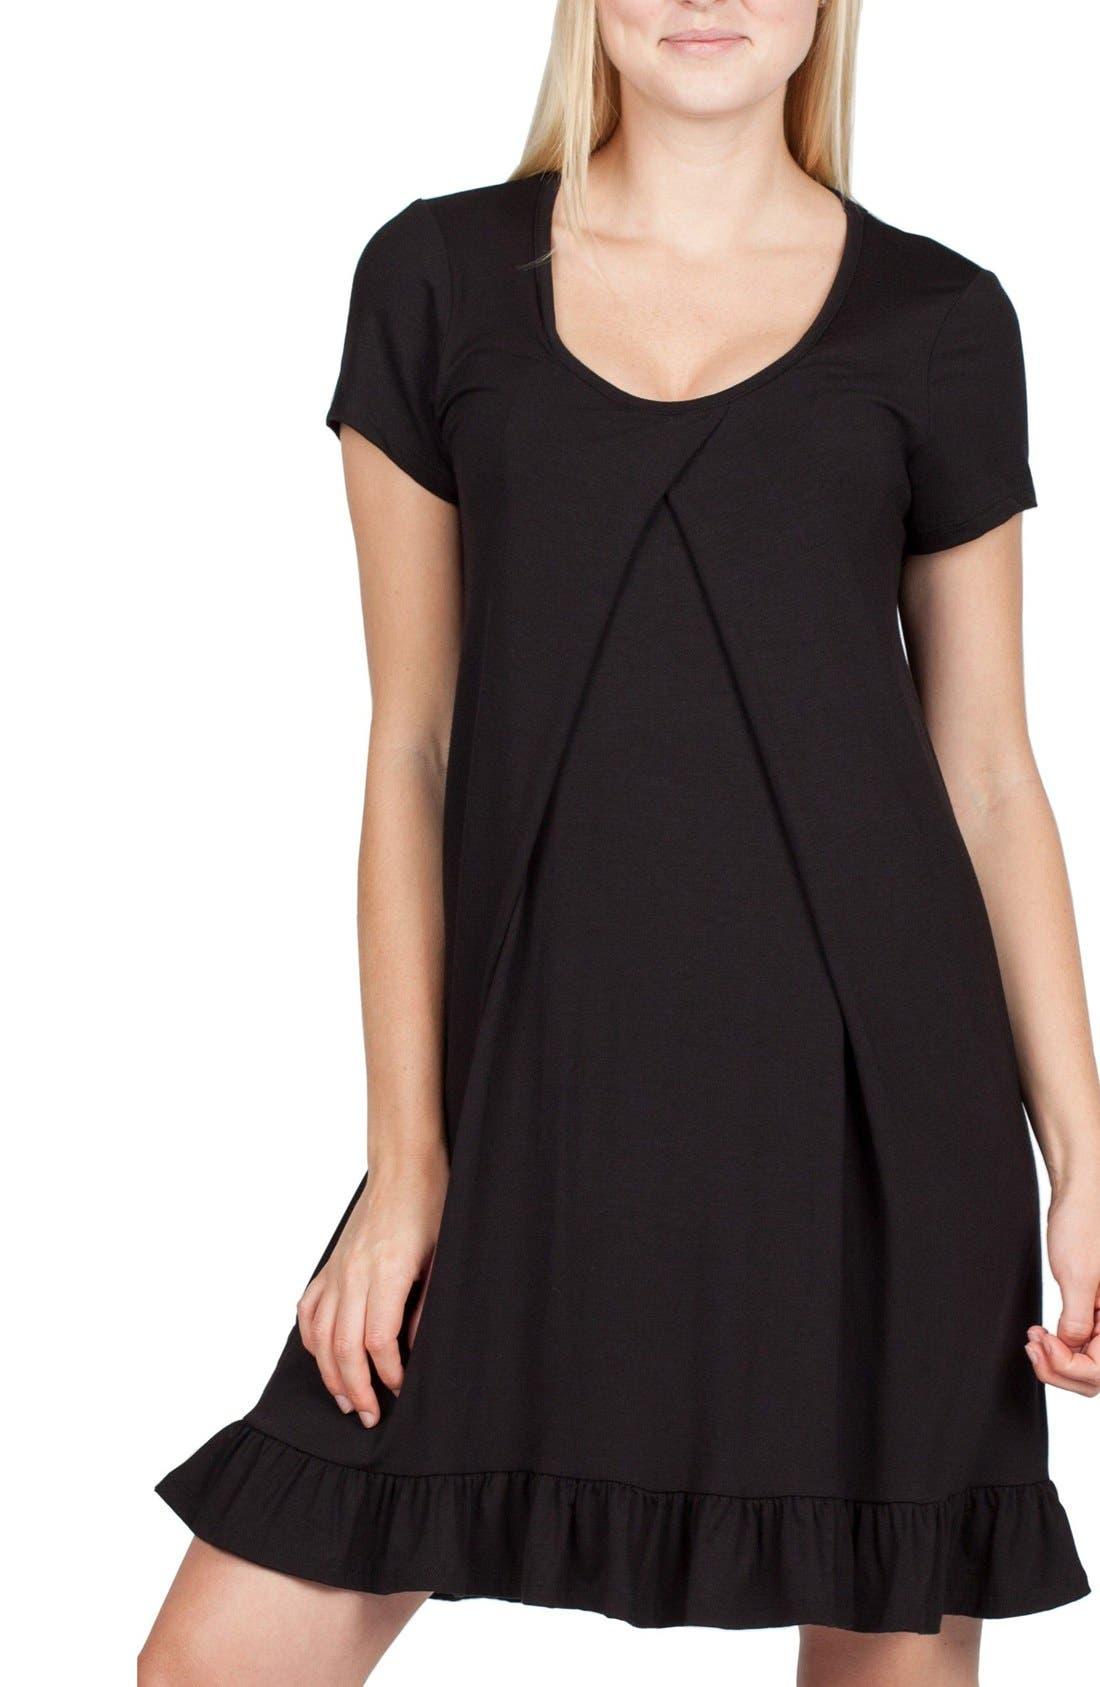 San Francisco Maternity/Nursing Nightgown,                             Main thumbnail 1, color,                             BLACK